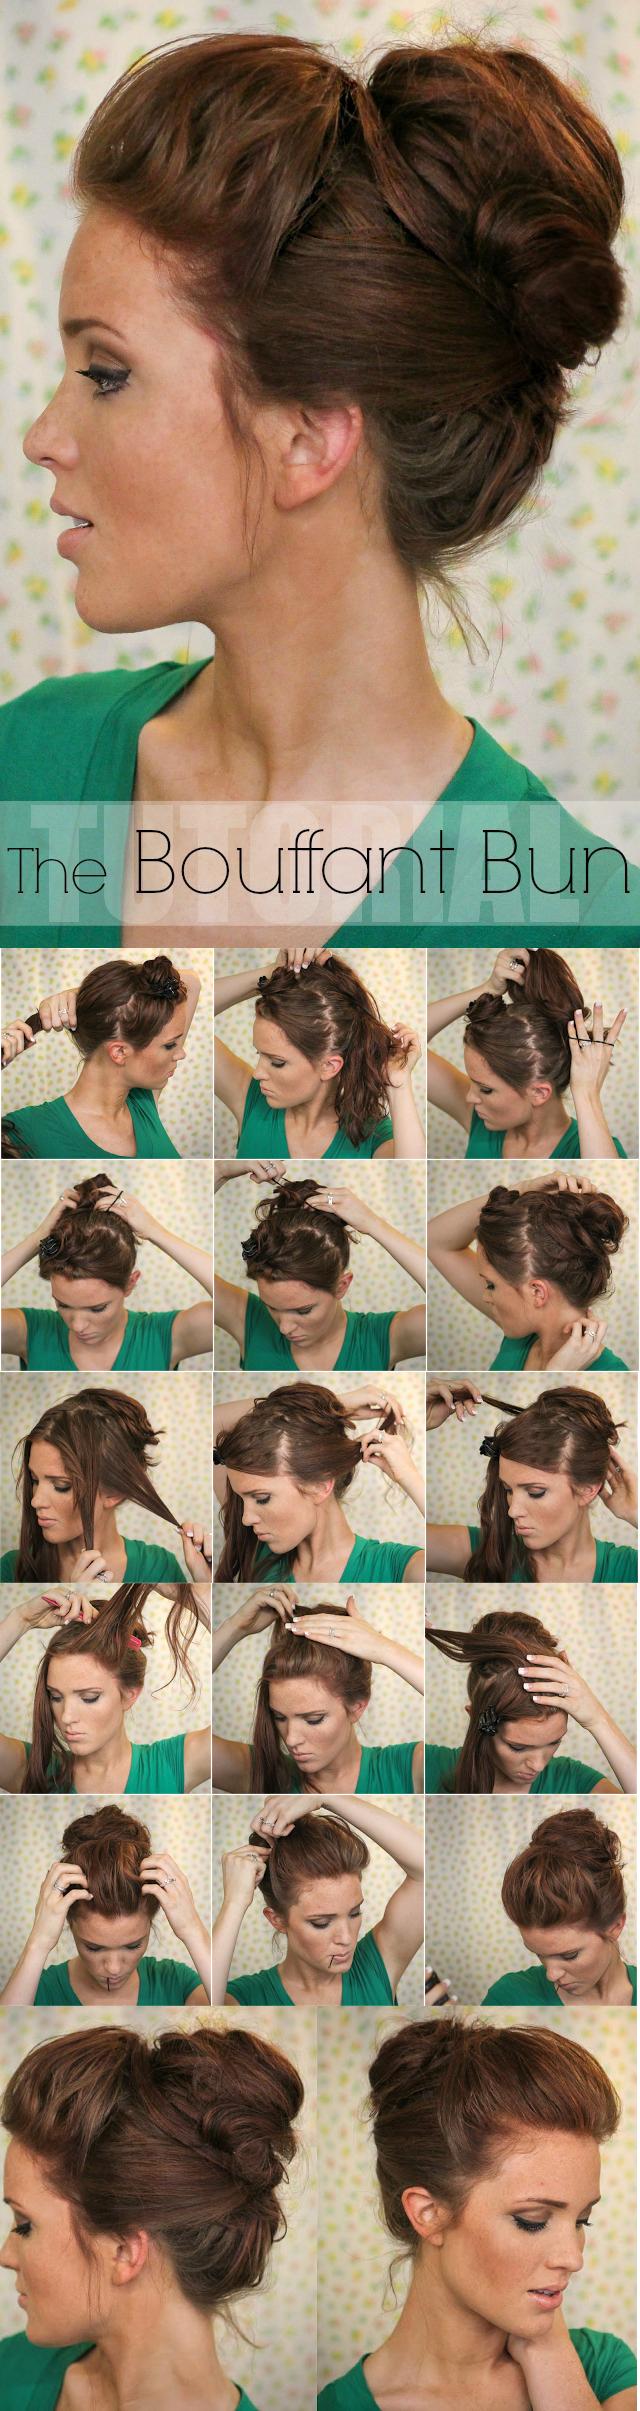 Wondrous 13 Rather Simple Bun Hairstyles Tutorials For 2014 Pretty Designs Short Hairstyles For Black Women Fulllsitofus